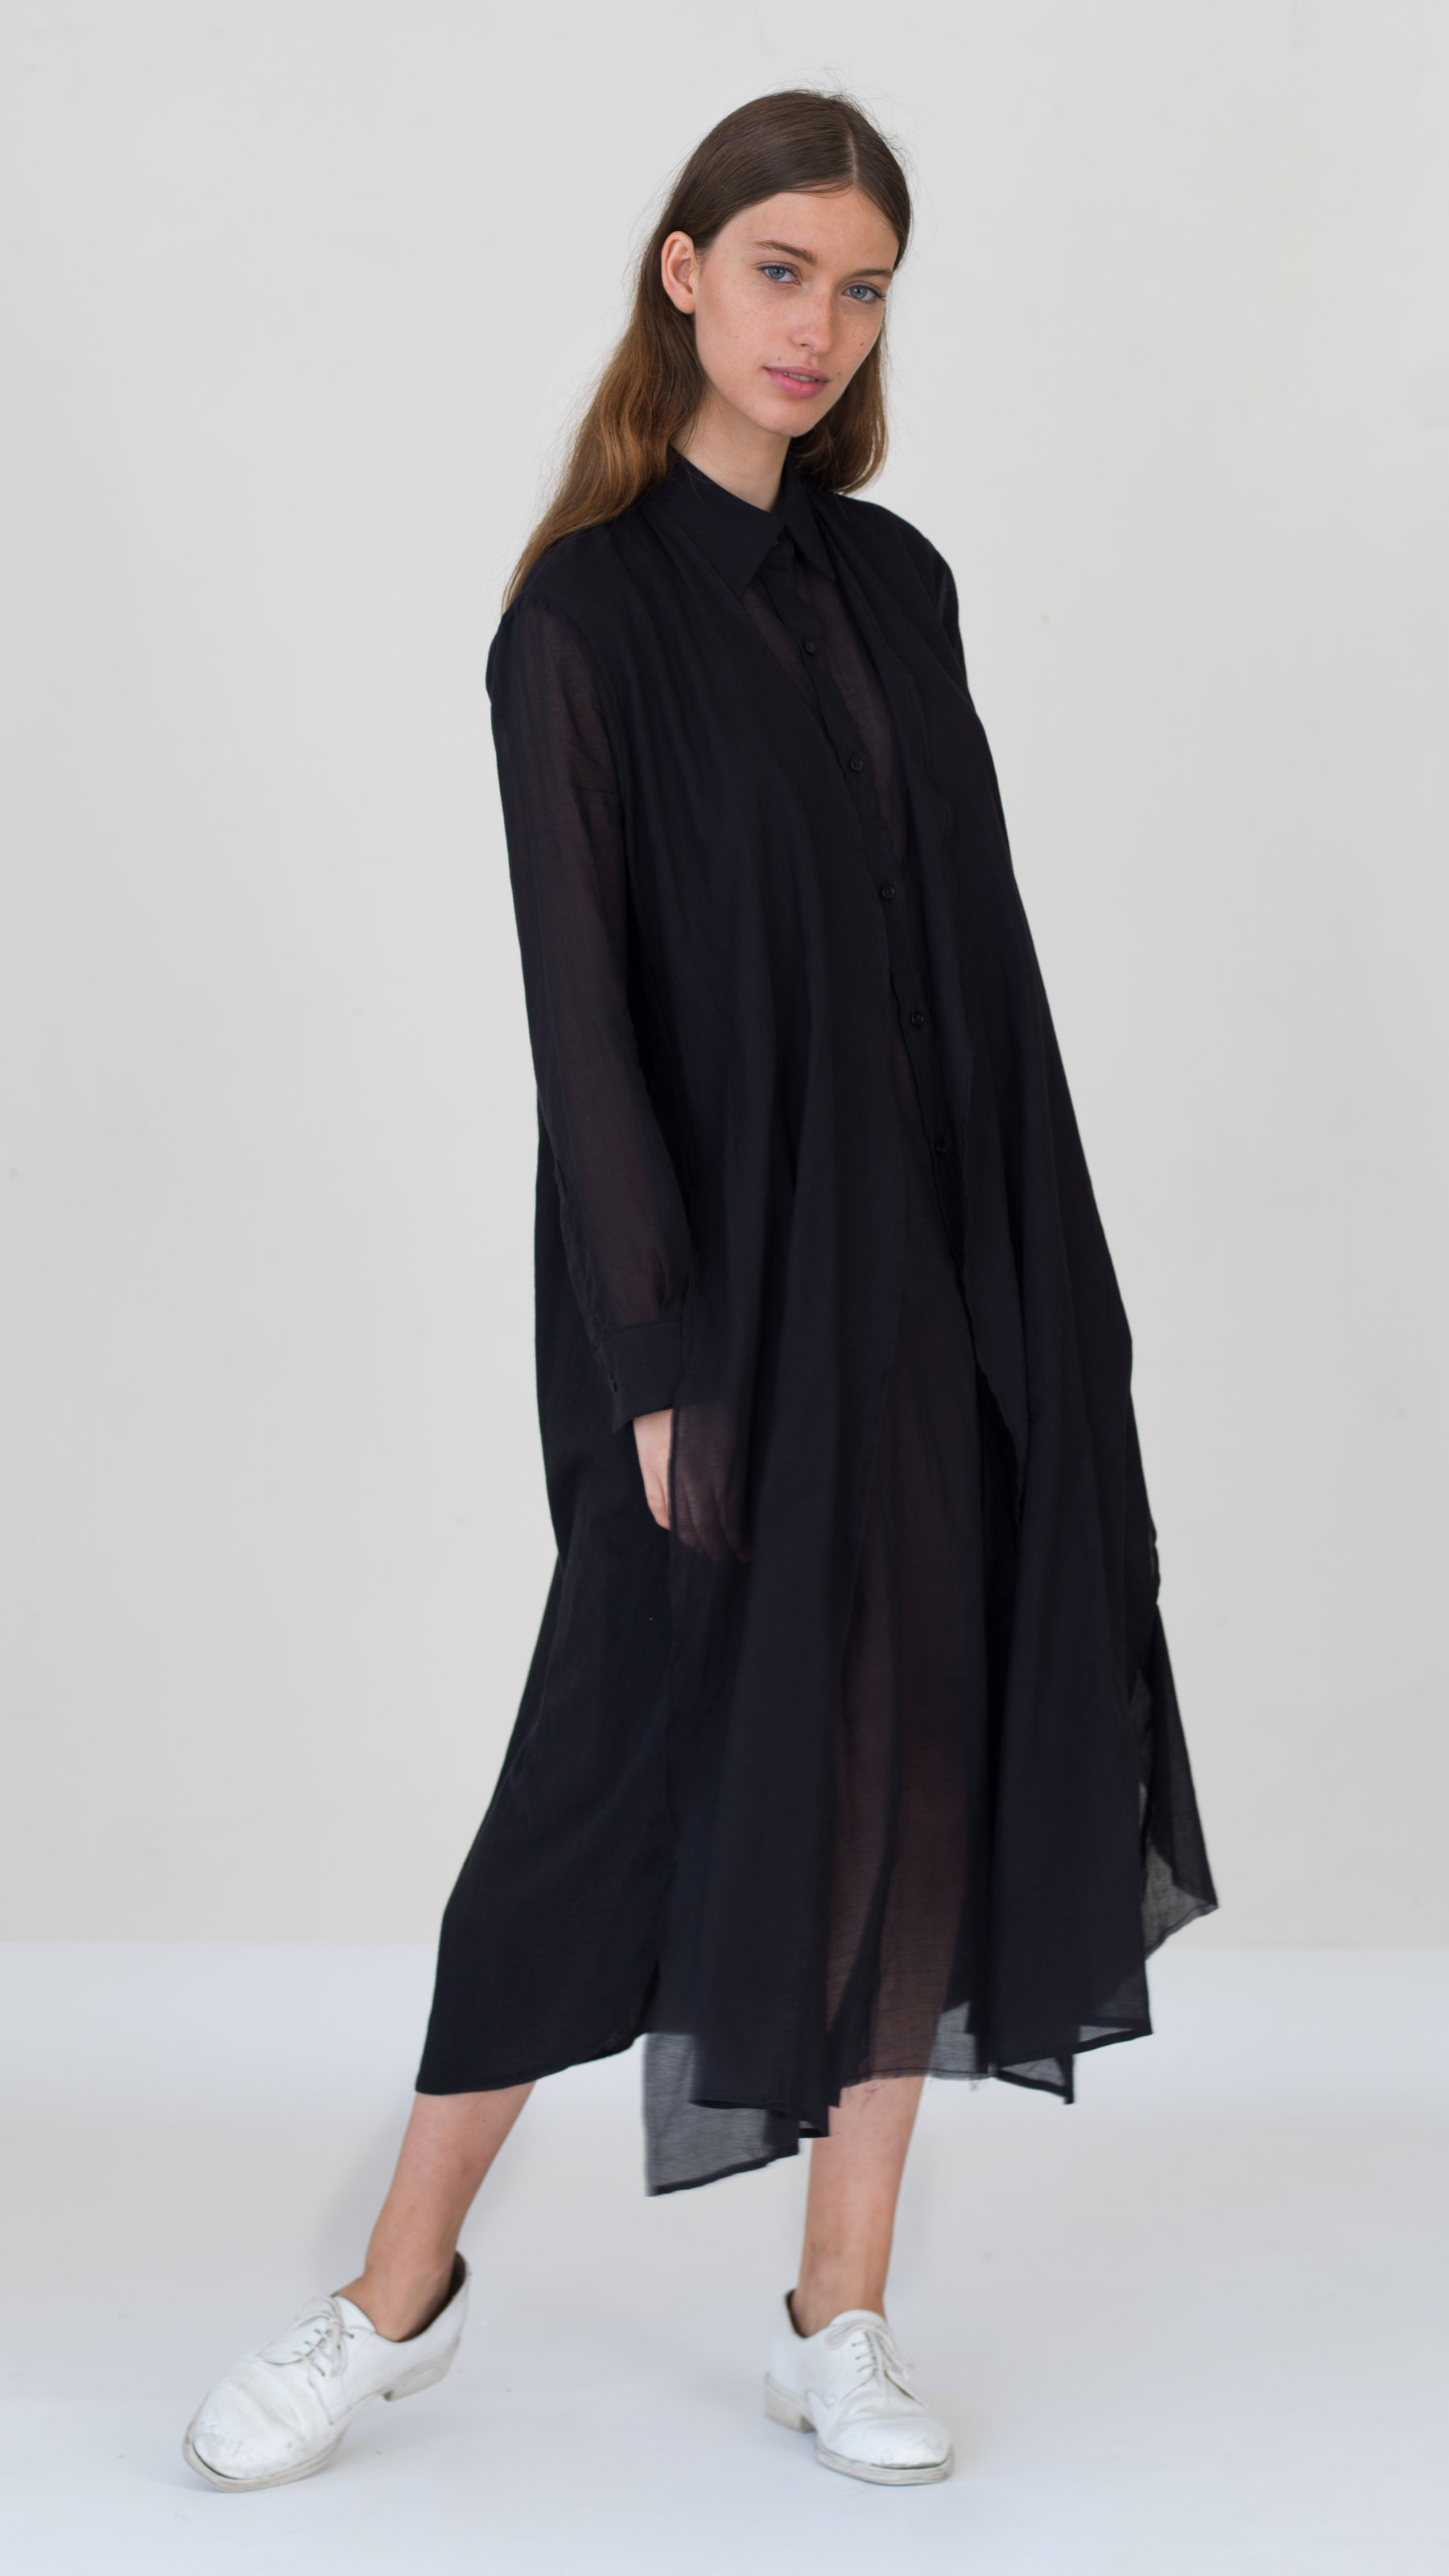 DADA_DIANE_DUCASSE_Dress_Shirt_Knotted_Black_2